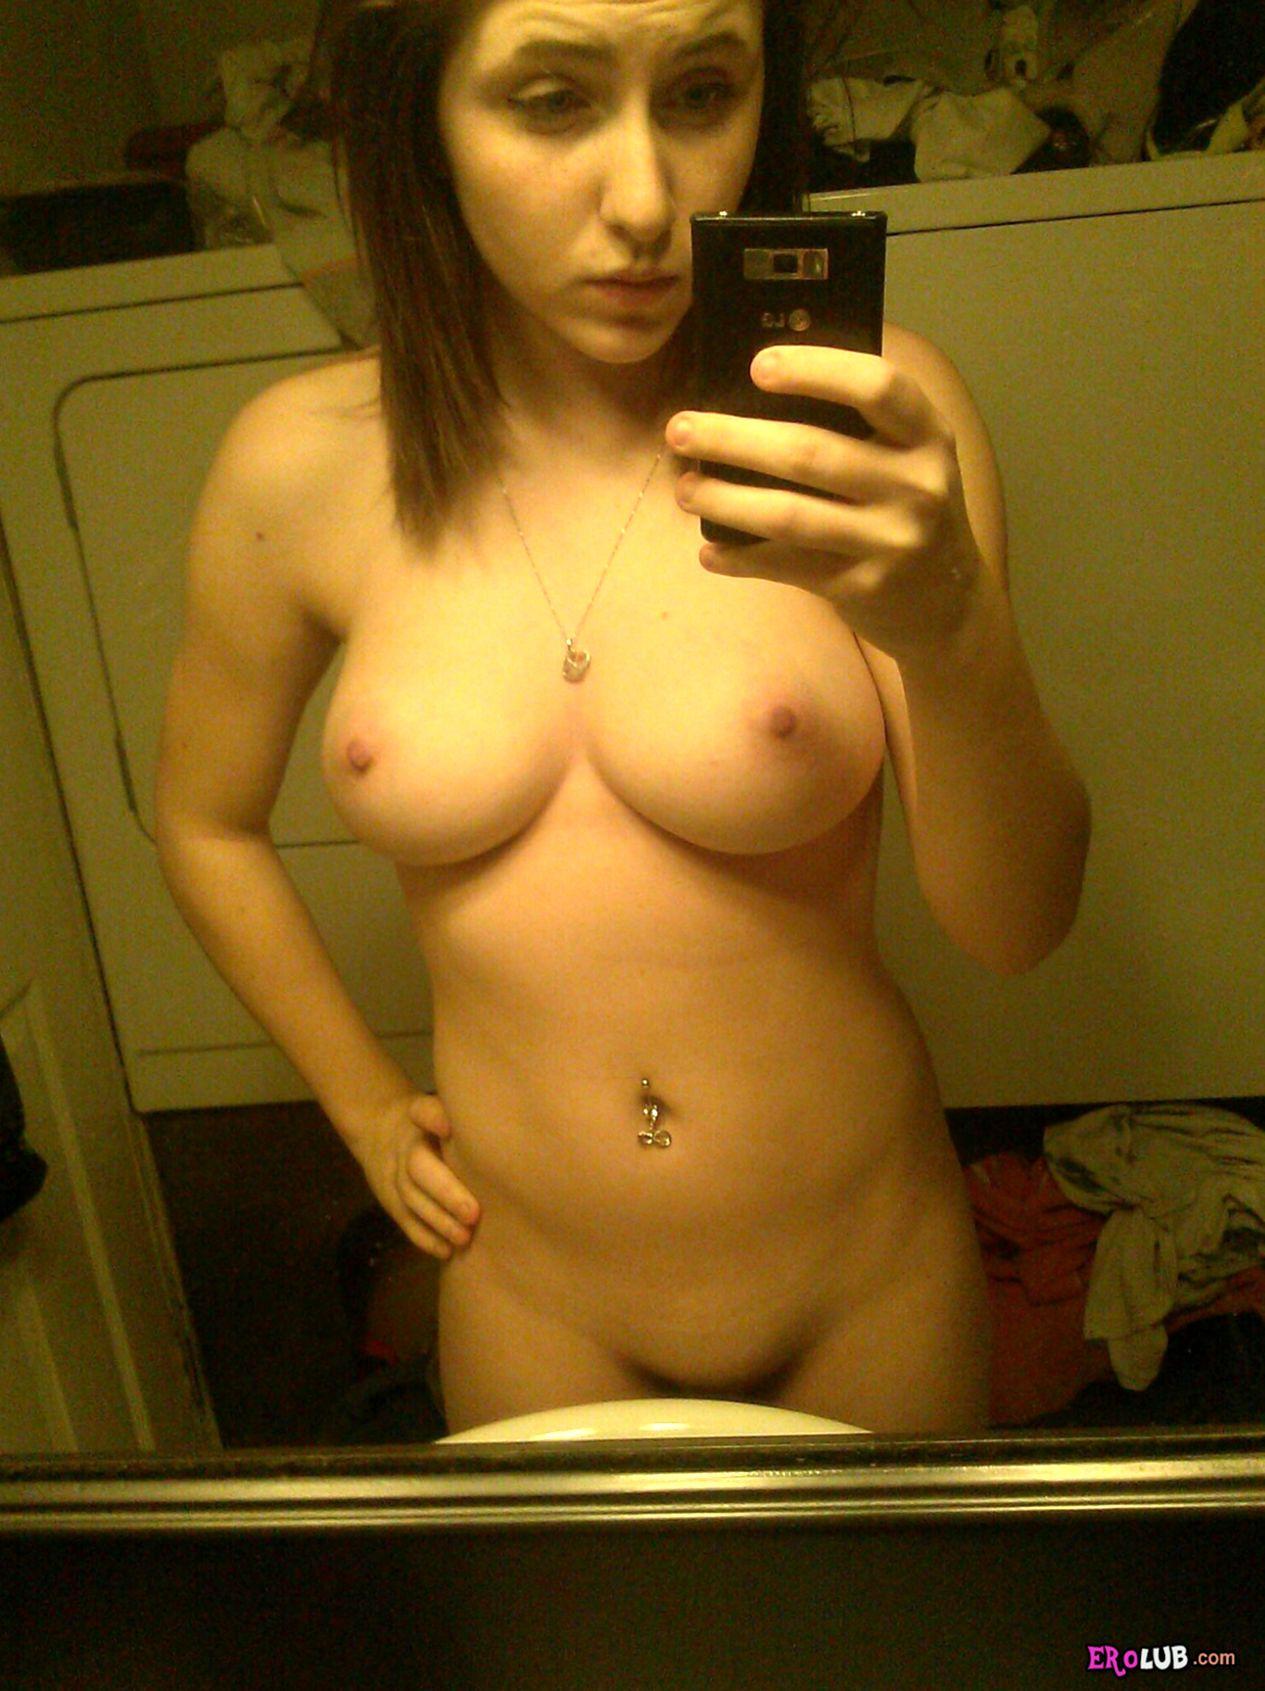 Фото эротика и порно видео на Tetkiinfo